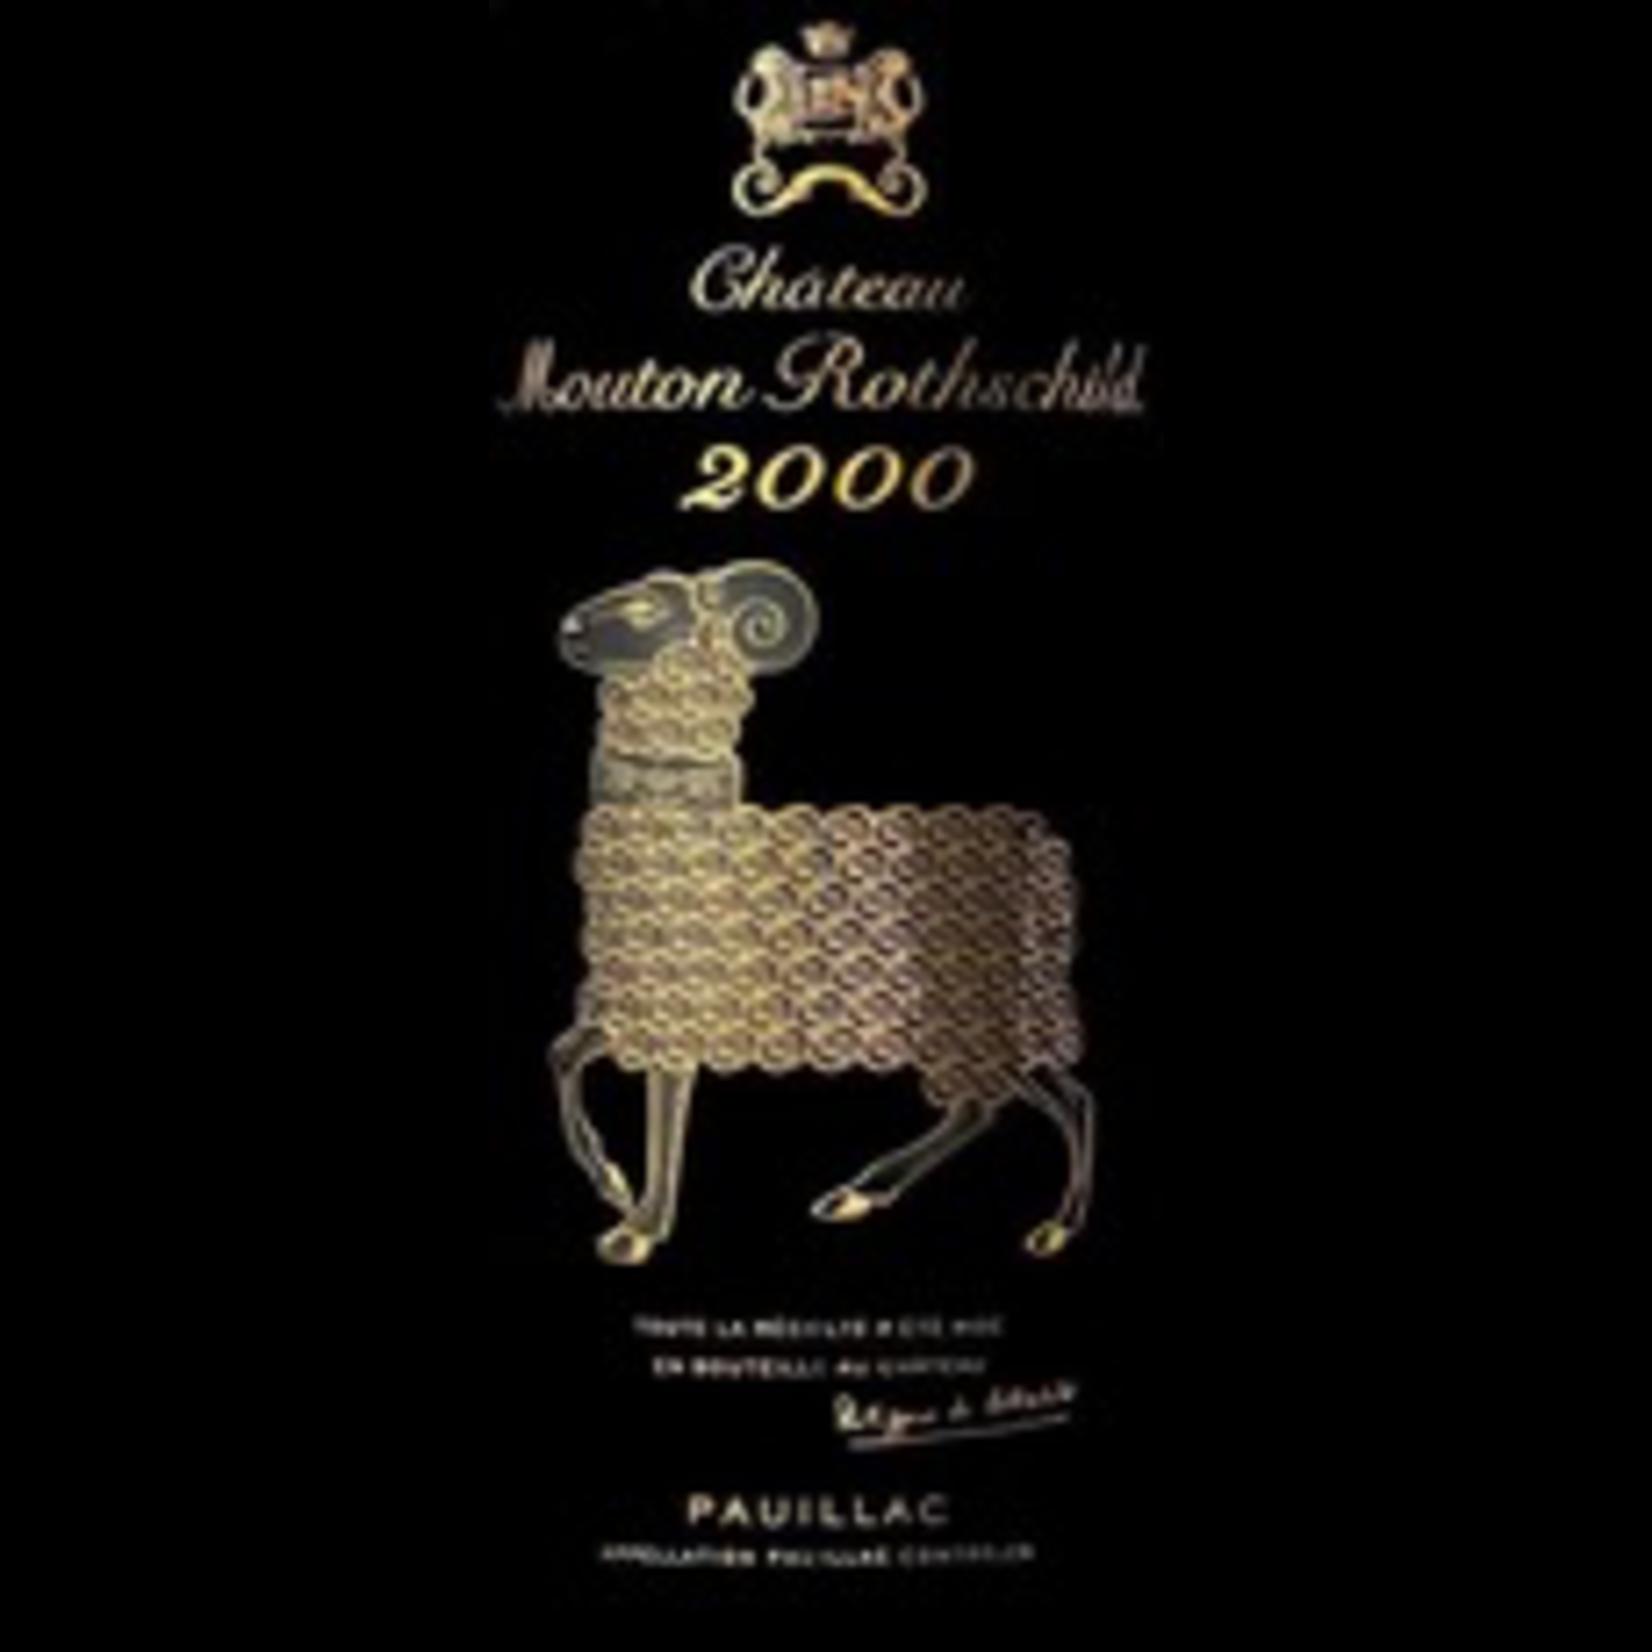 Wine Chateau Mouton Rothschild 2000 3L